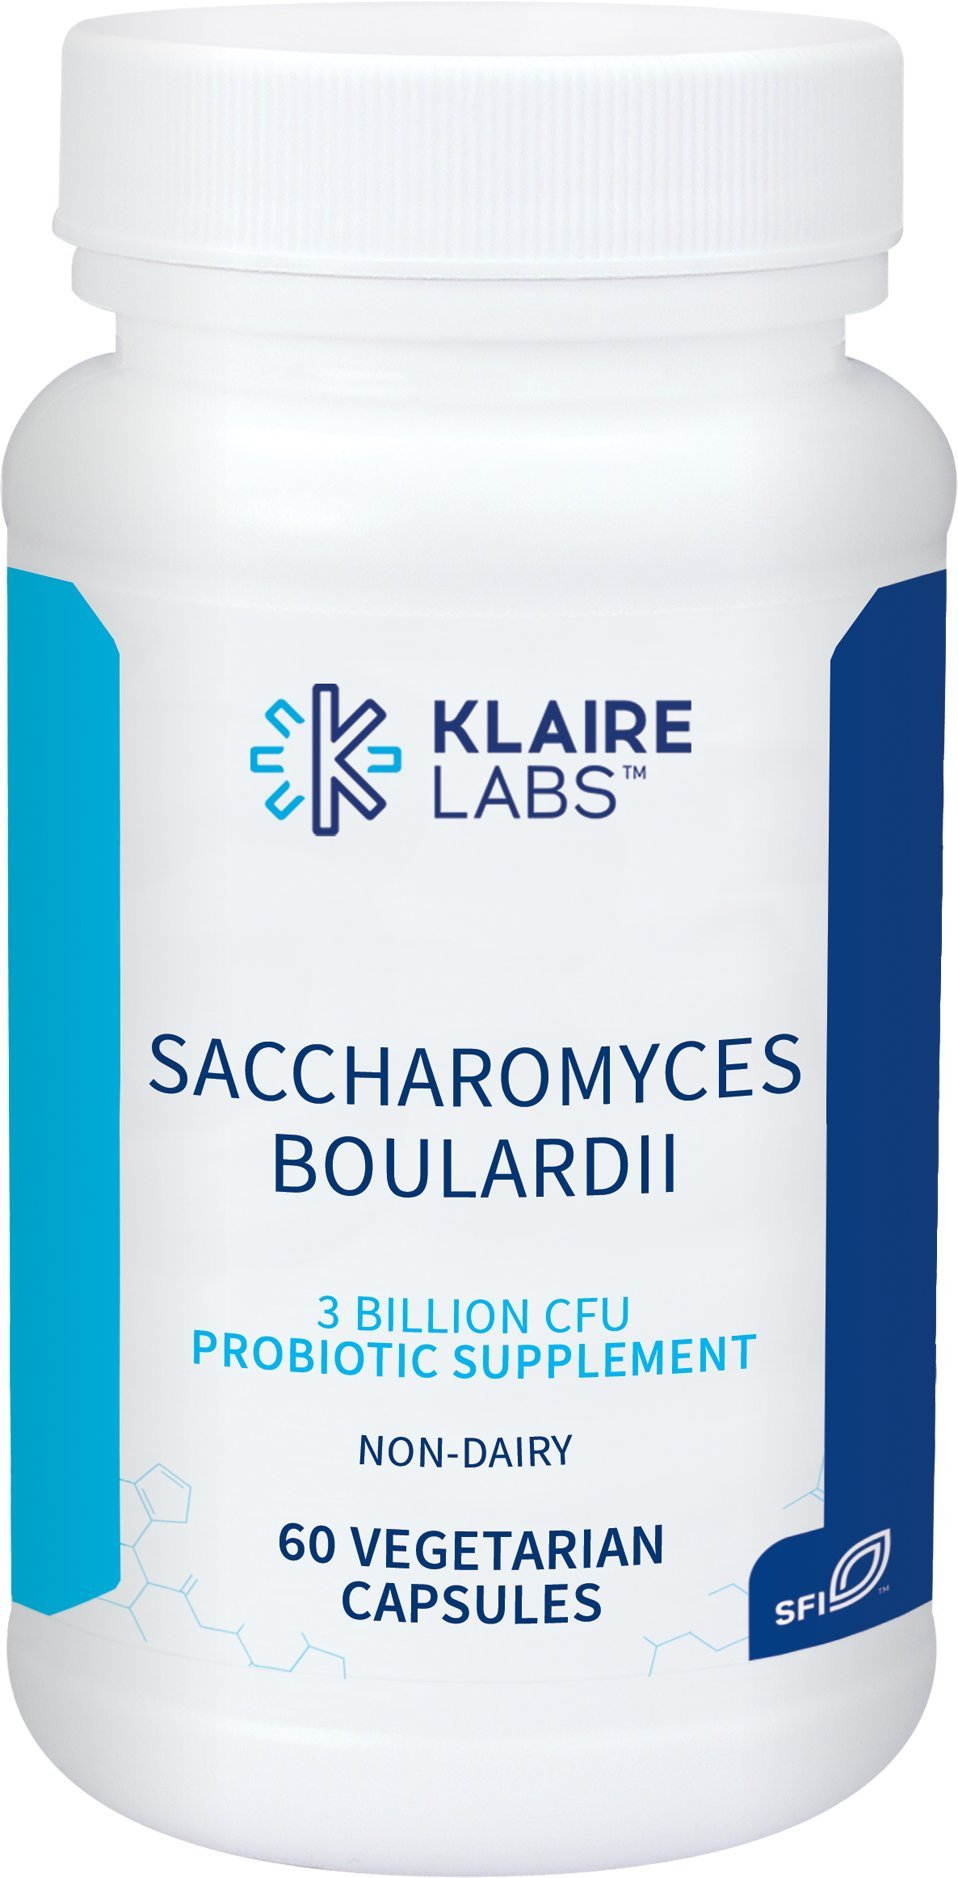 Klaire Labs Saccharomyces Boulardii - 3 Billion CFU Powerful Shelf-Stable Yeast Probiotic for Kids, Men & Women, Hypoallergenic & Non-Dairy (60 Capsules)